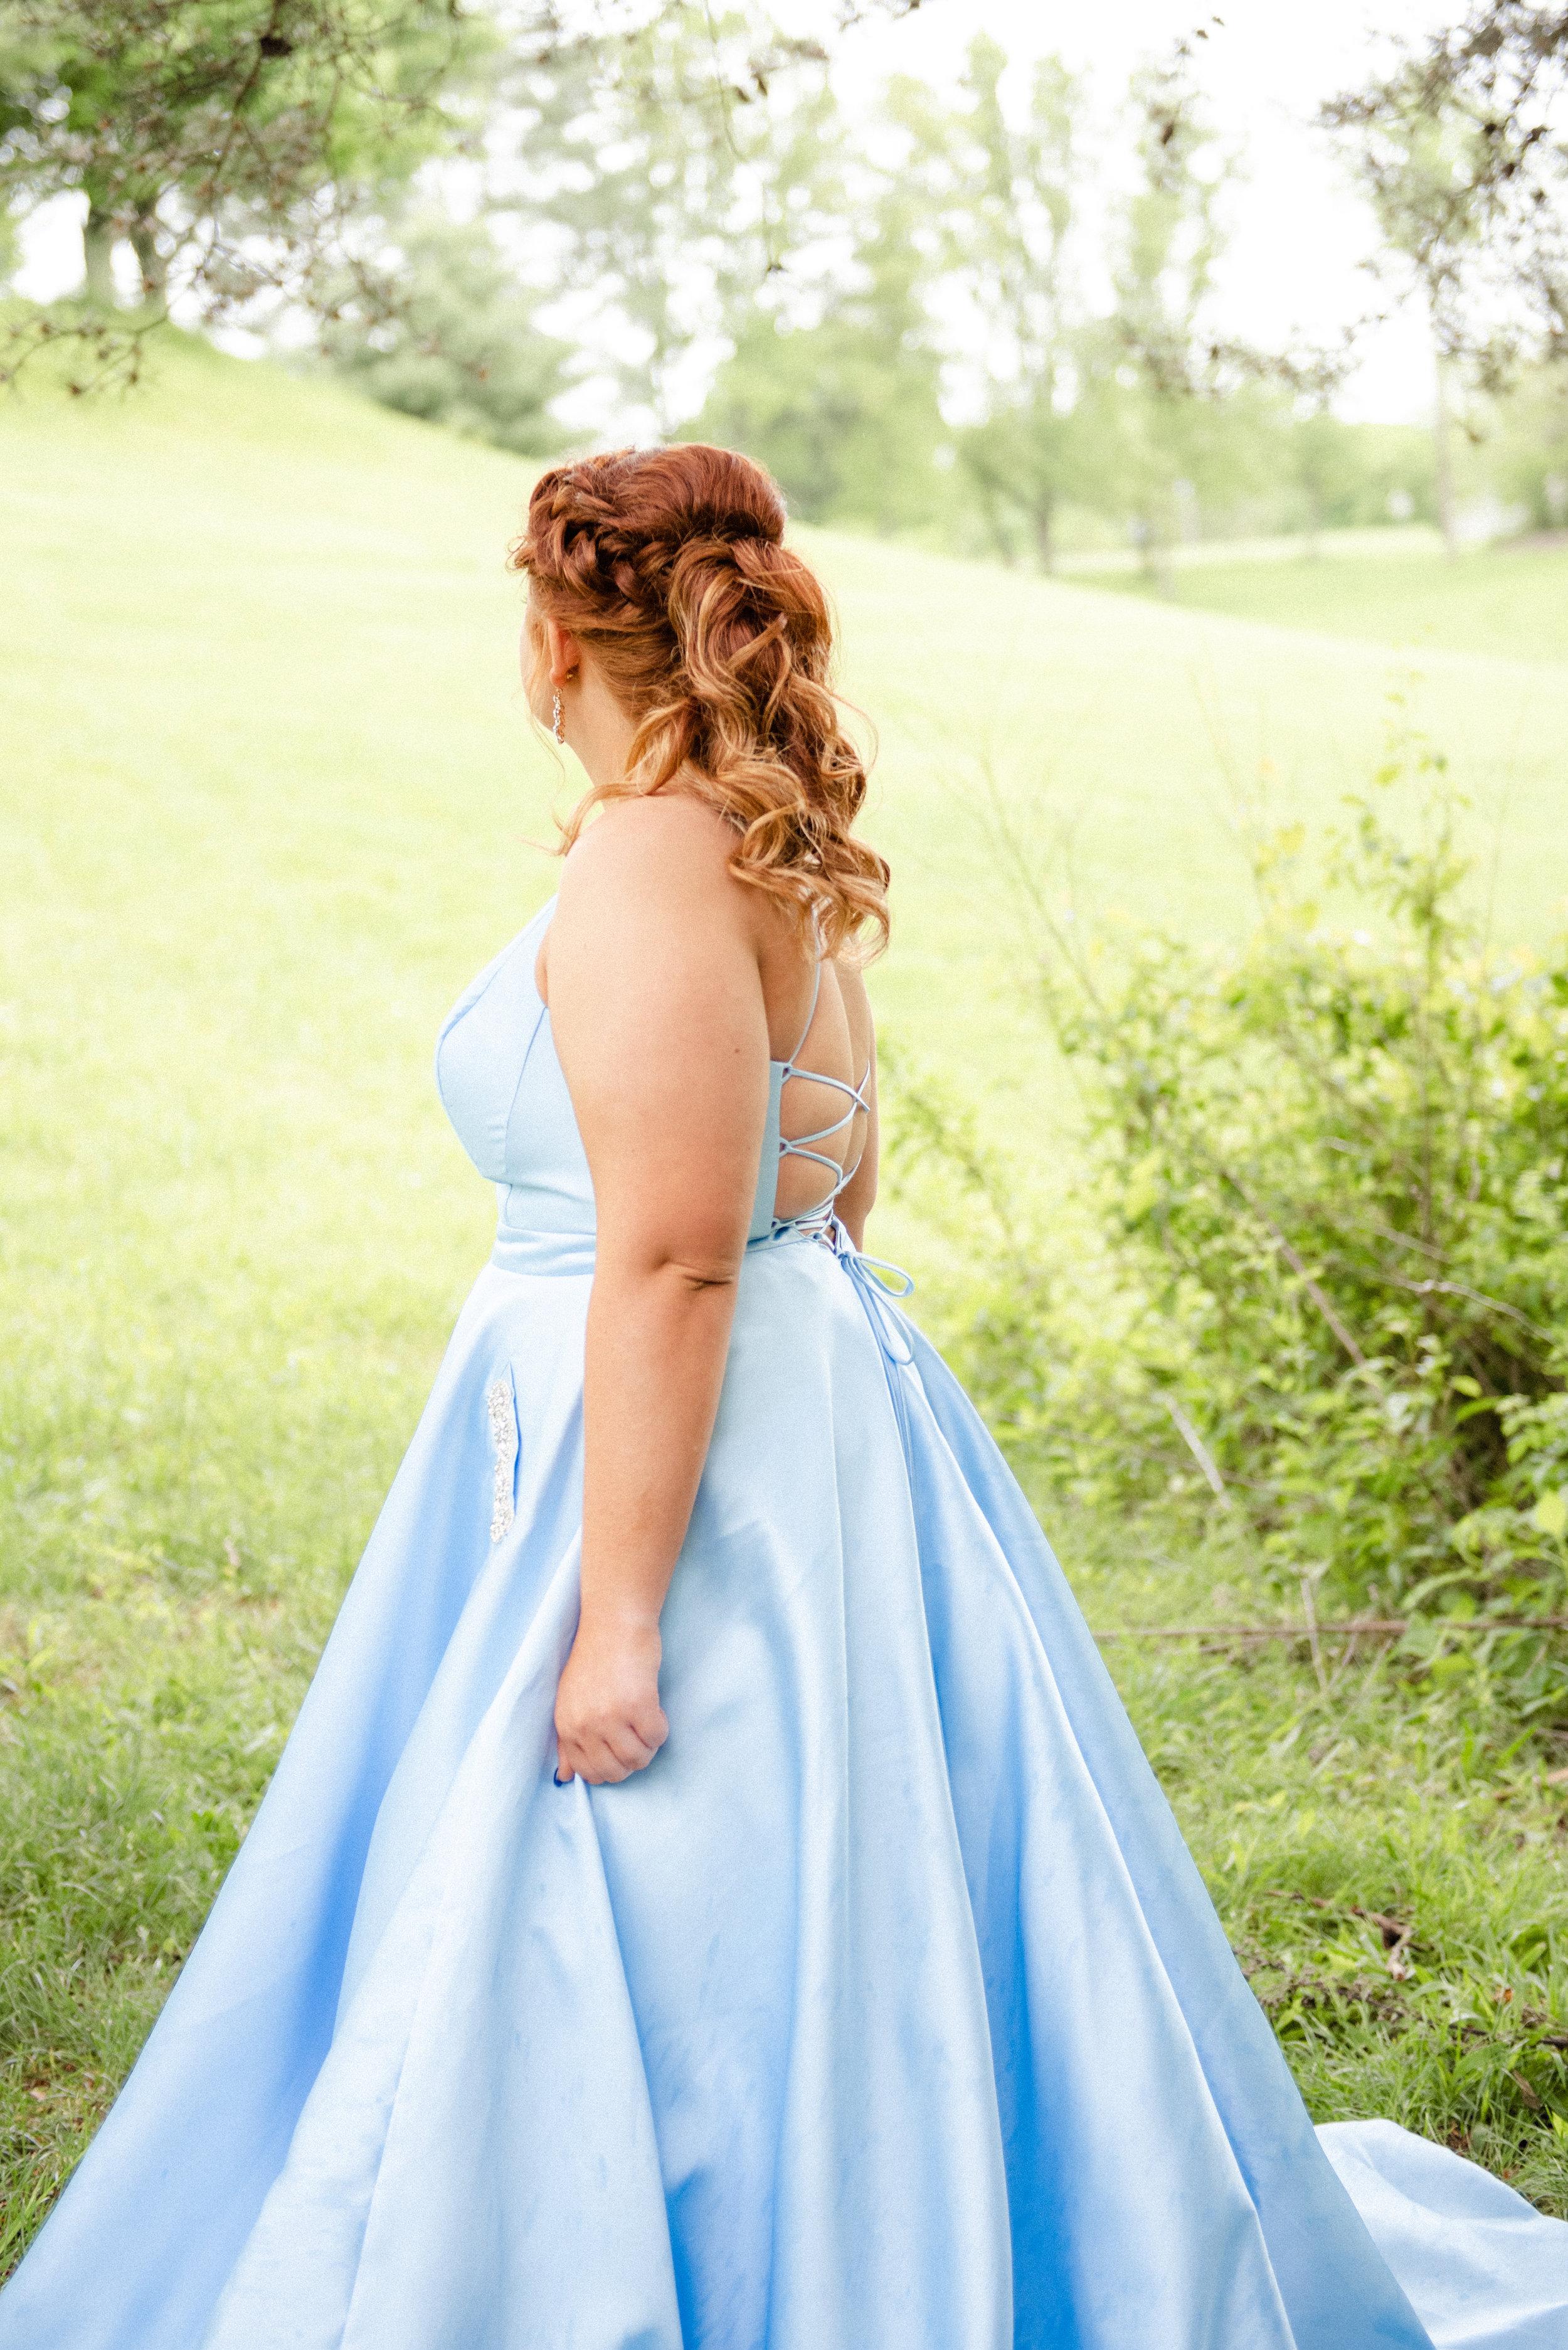 AbigailBunch-Prom-32.jpg